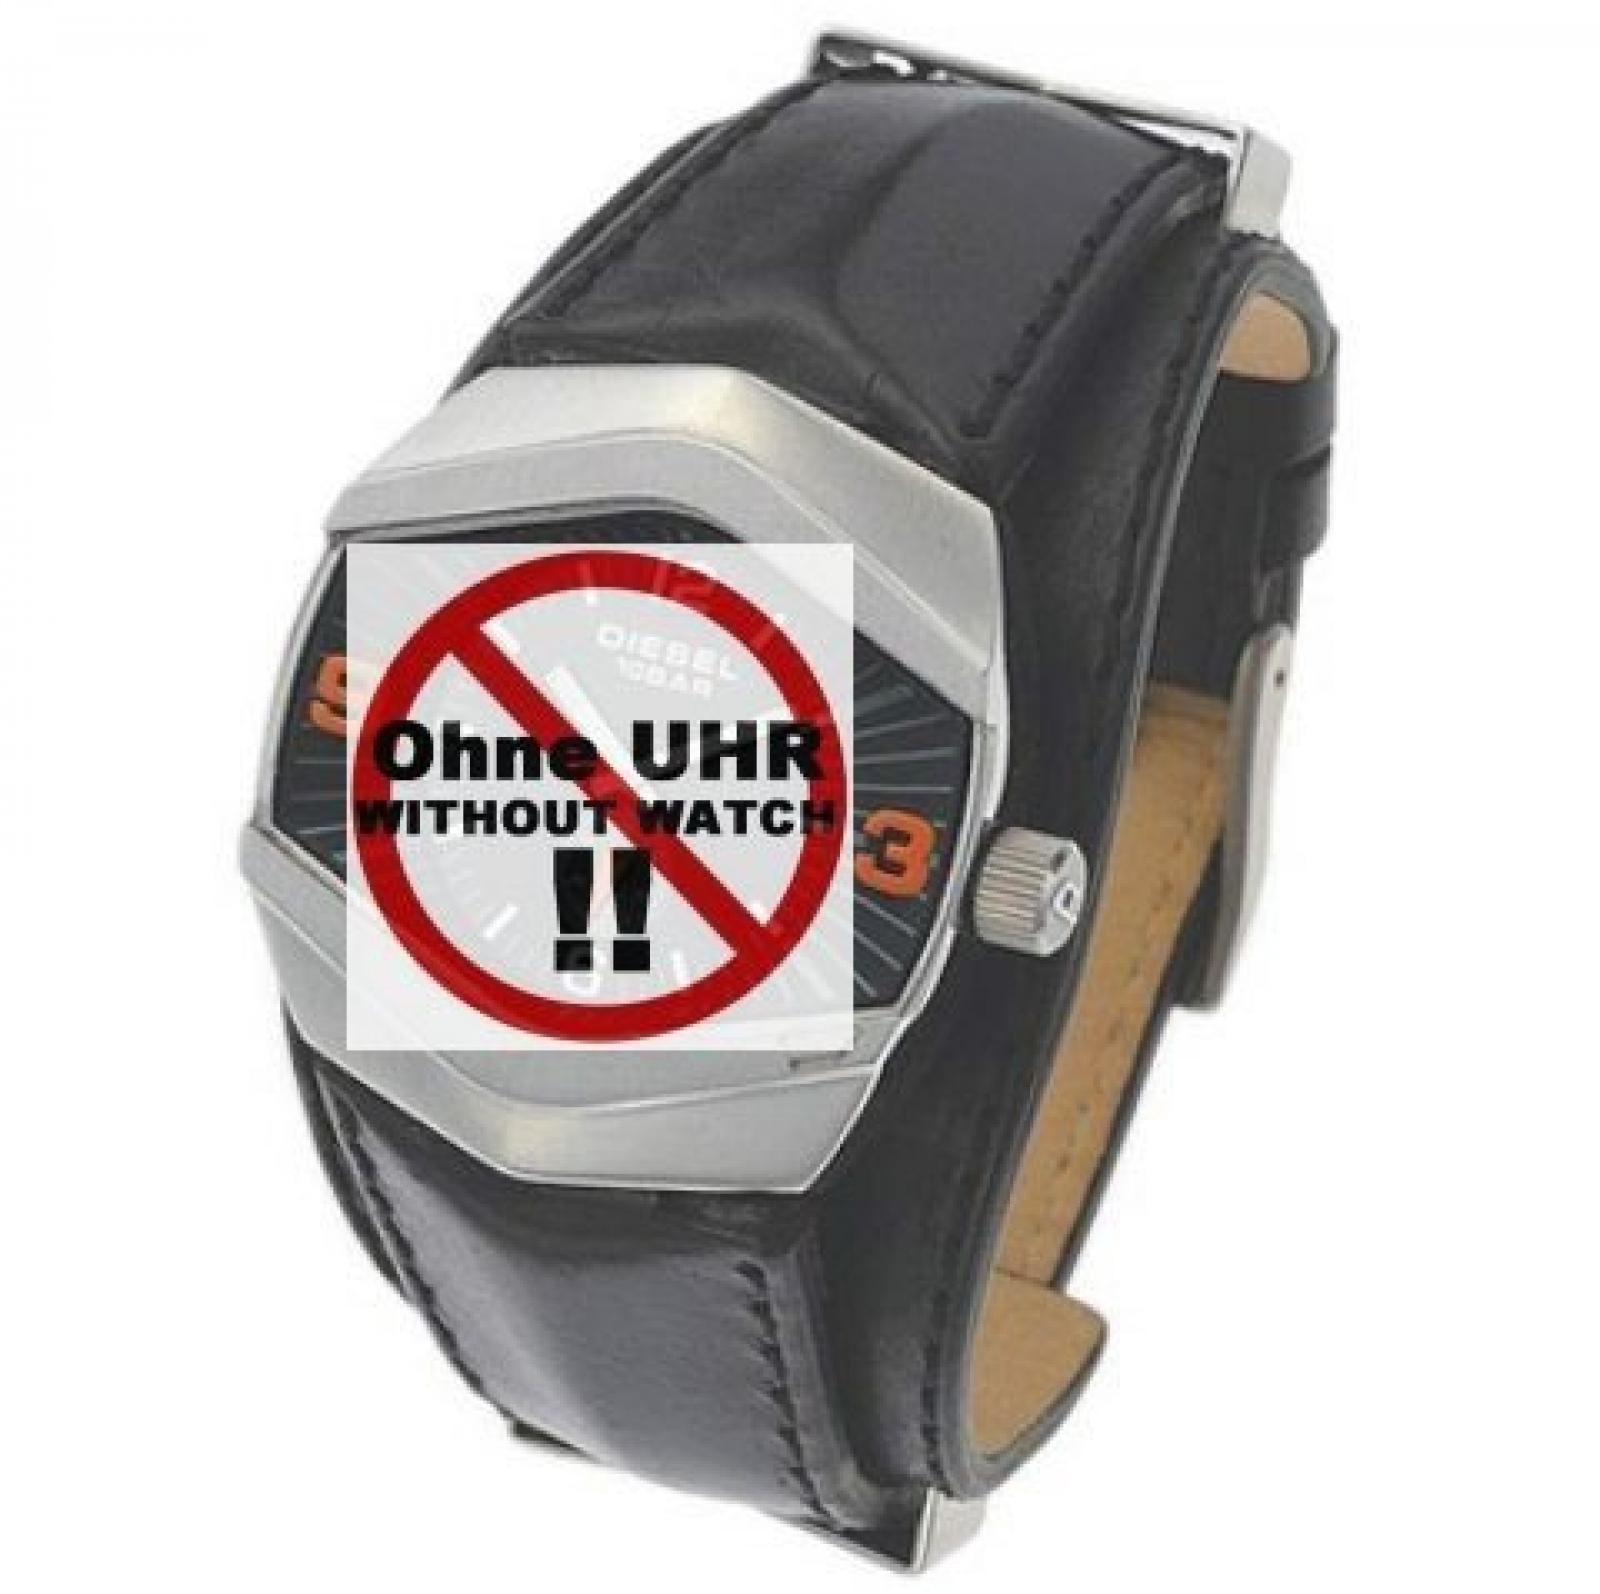 Diesel Uhrband Ersatzband Uhrenarmband Wechselarmband LB-DZ4073 Original Lederband für DZ 4073